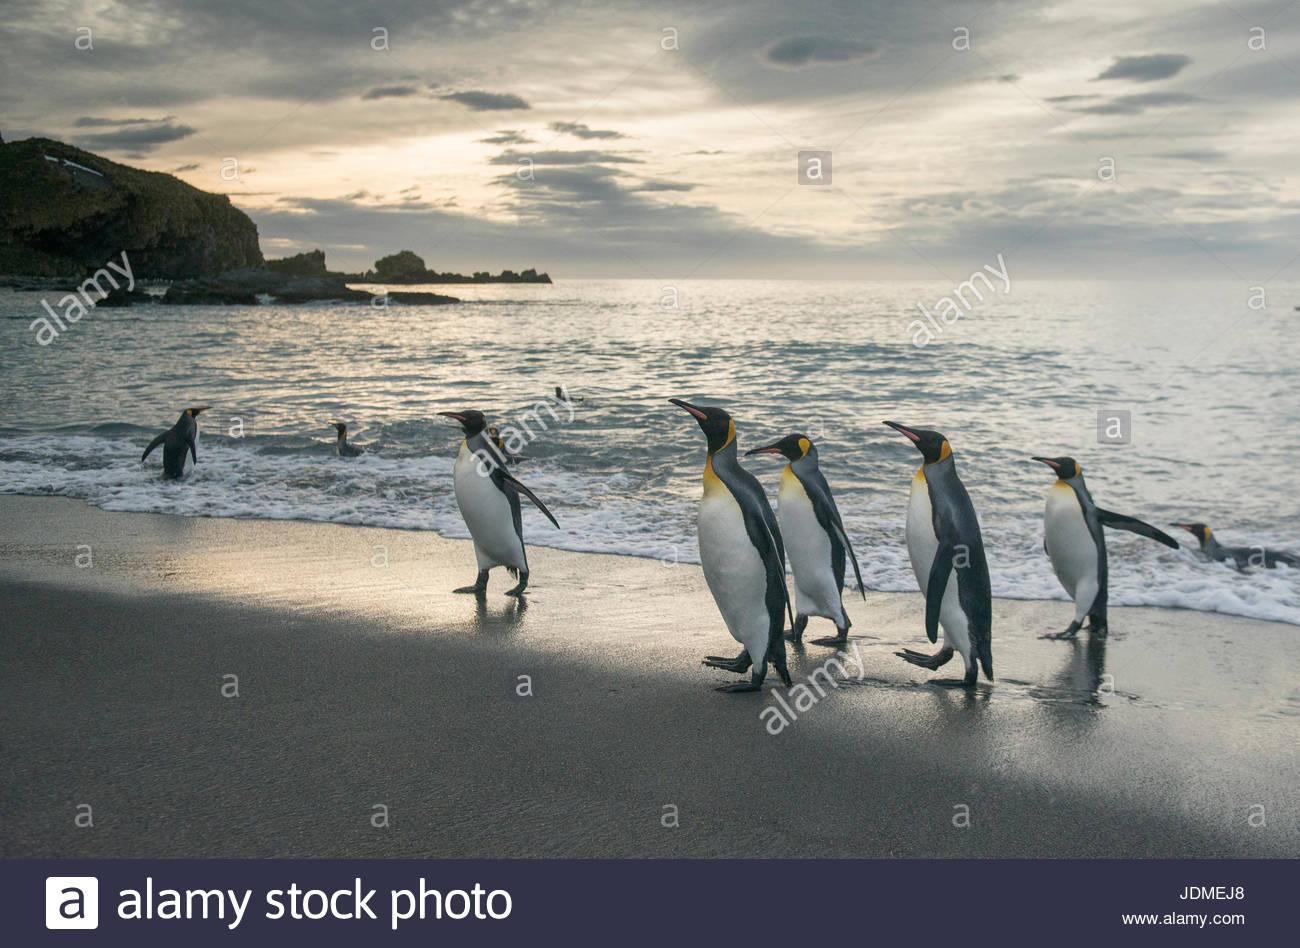 King penguins walk along the shoreline at sunrise at Gold Harbour. Stock Photo